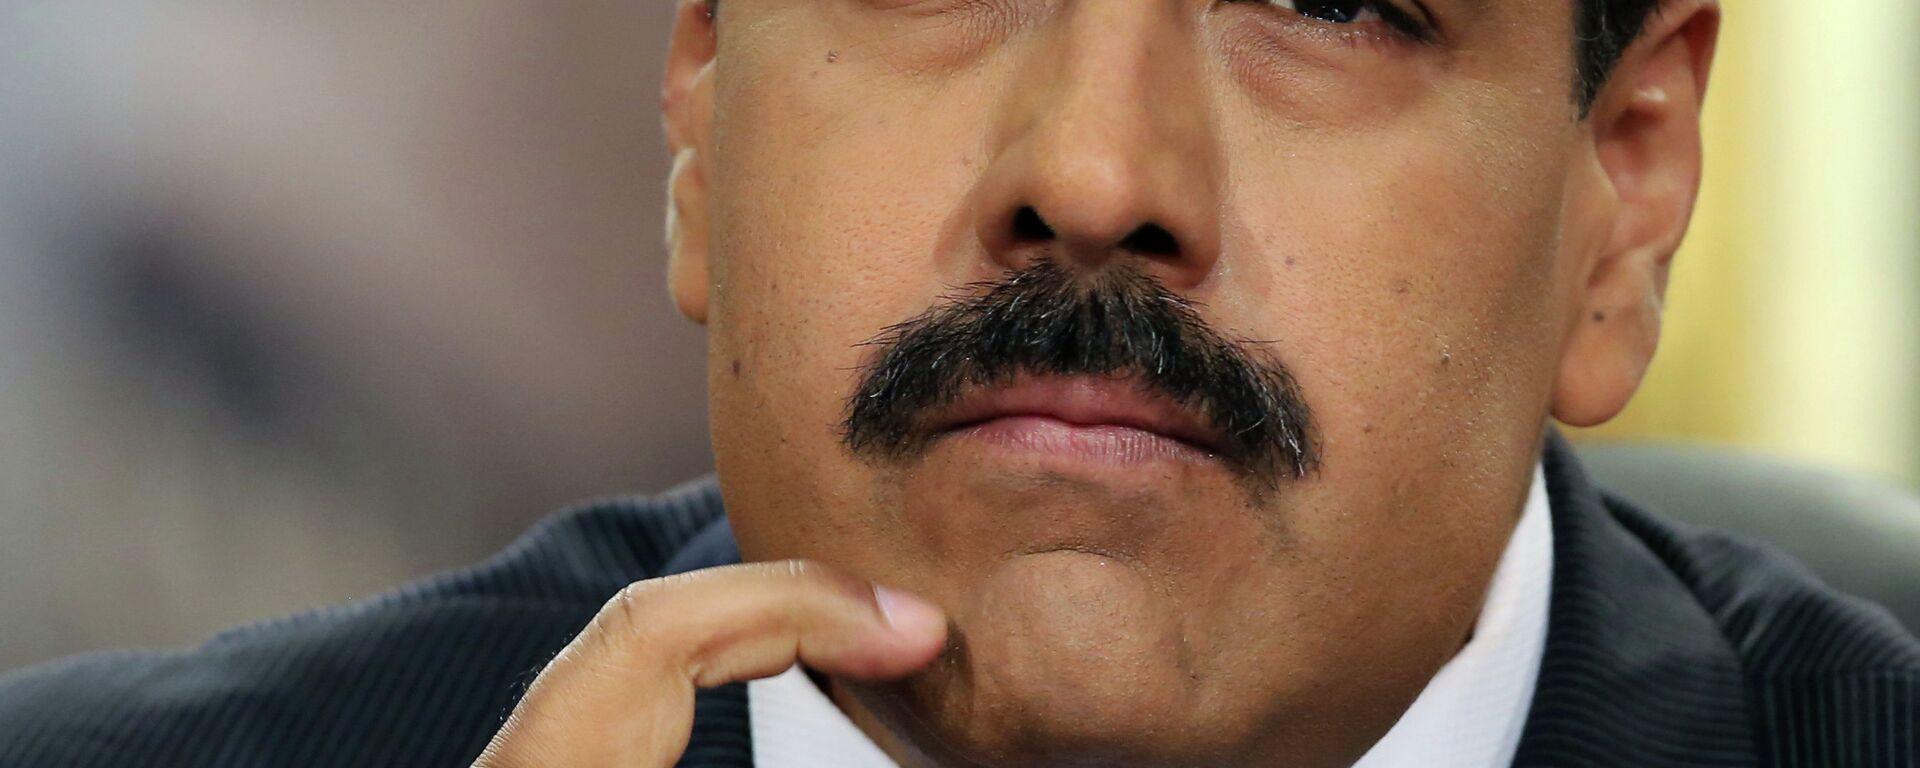 Venezuela's President Nicolas Maduro pauses during his speech at a press conference at Miraflores Presidential Palace in Caracas, Venezuela, Tuesday, Dec. 30, 2014 - Sputnik Mundo, 1920, 12.05.2021